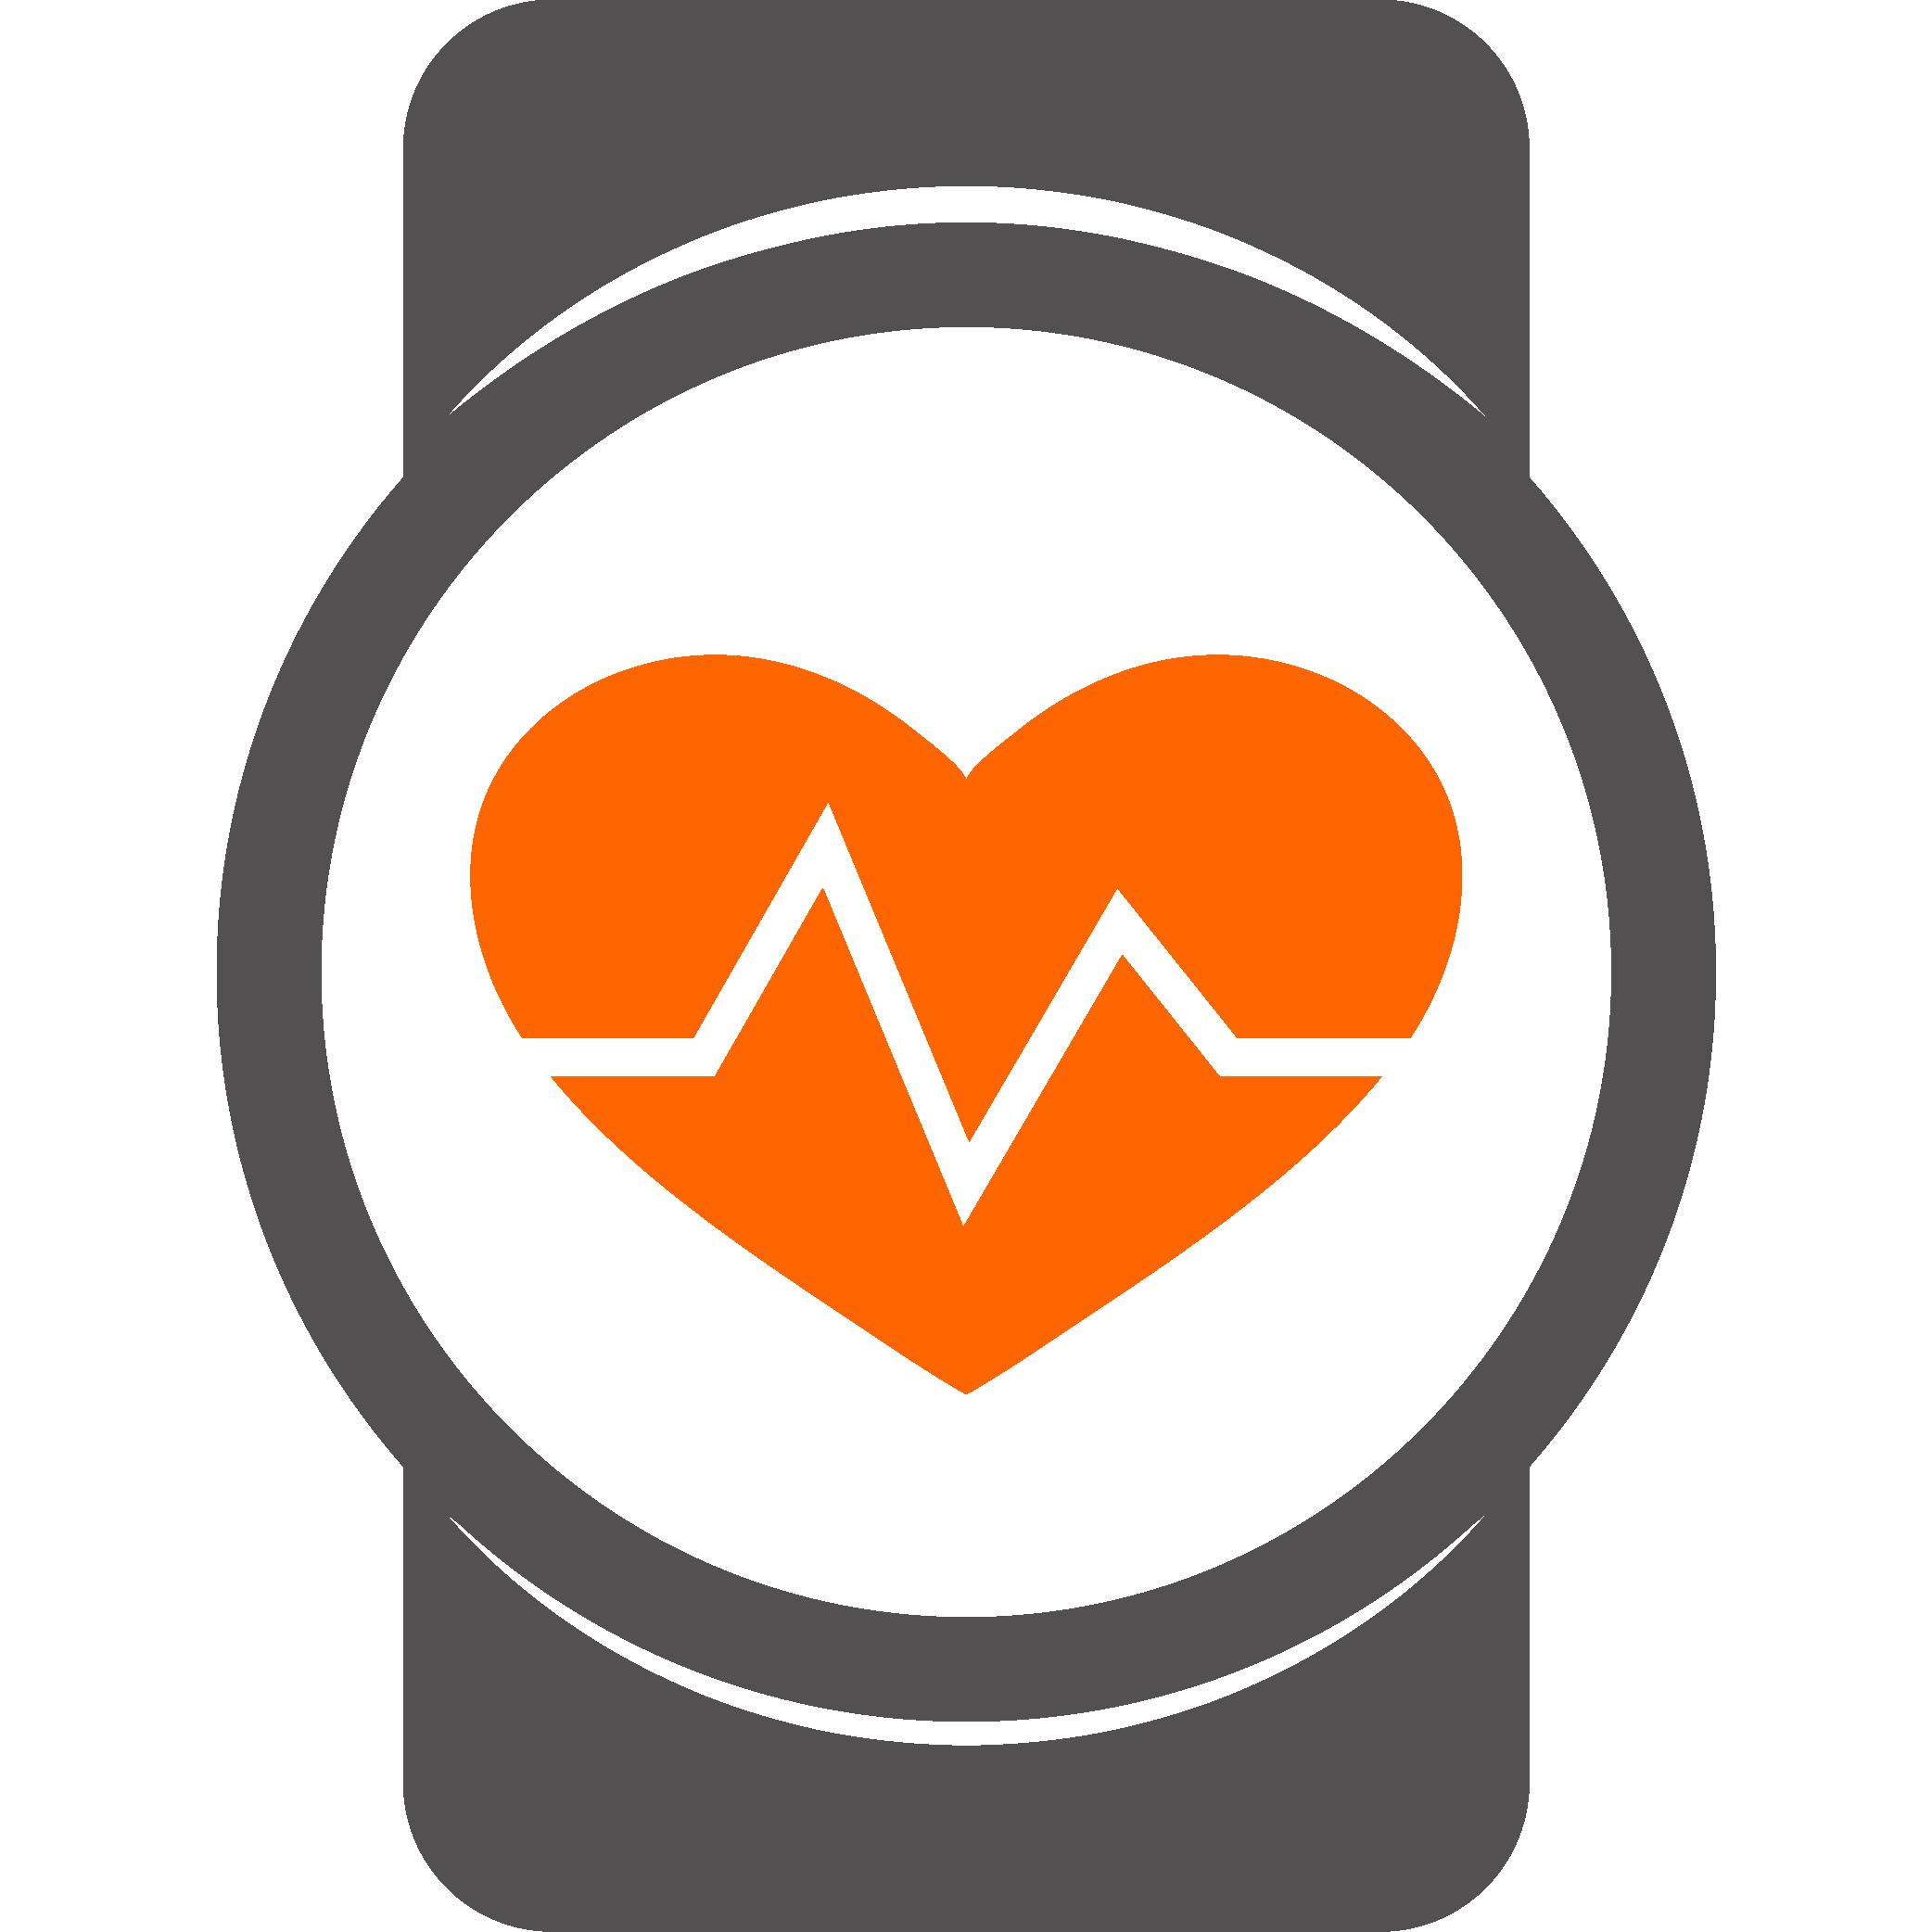 Logo clipart fitness. Home will power tracker